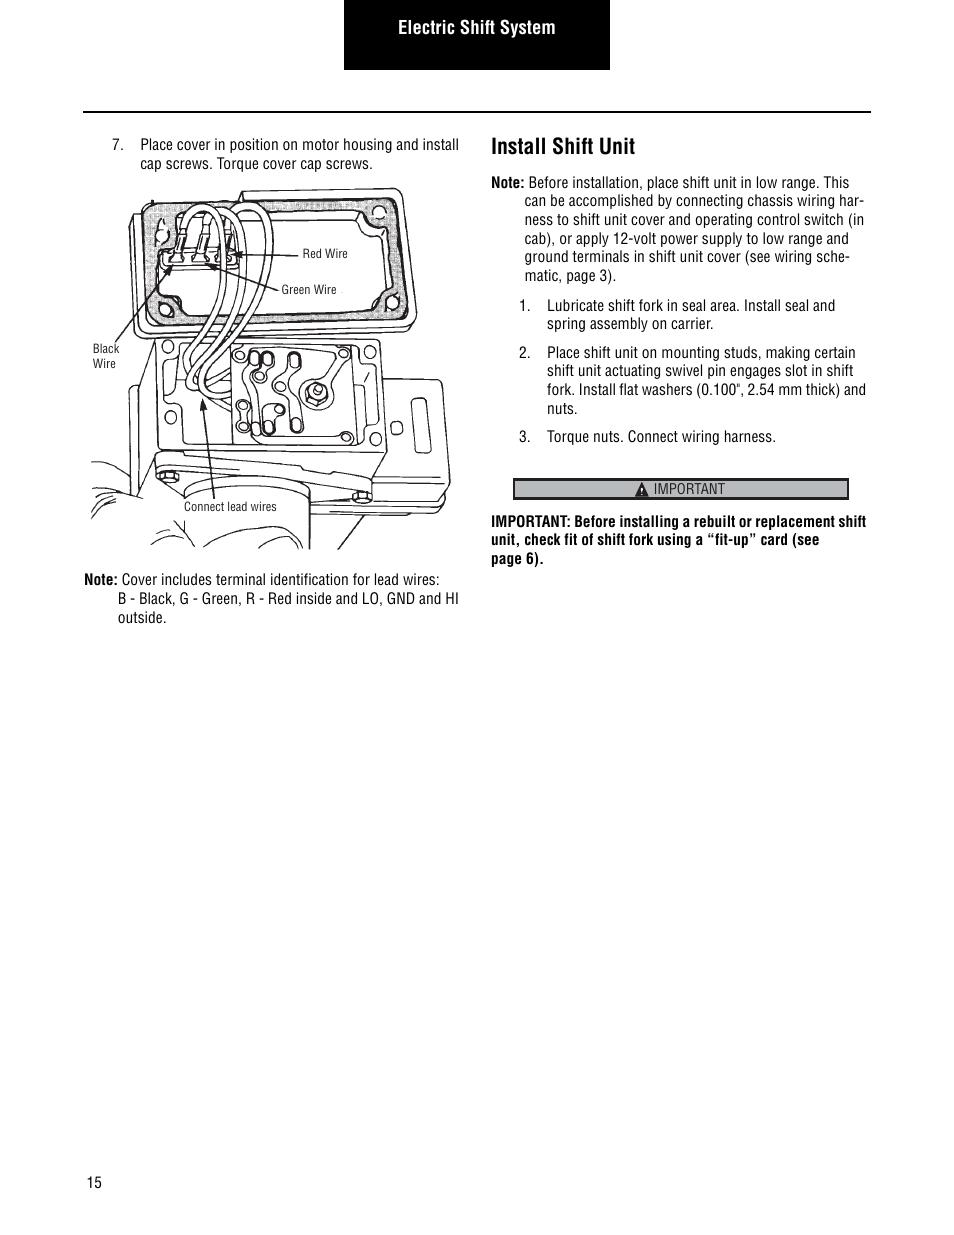 Wiring 2 Speed Rear Axle Diagram Books Of Eaton Diagrams Install Shift Unit Spicer Drive Axles Service Manual Rh Manualsdir Com